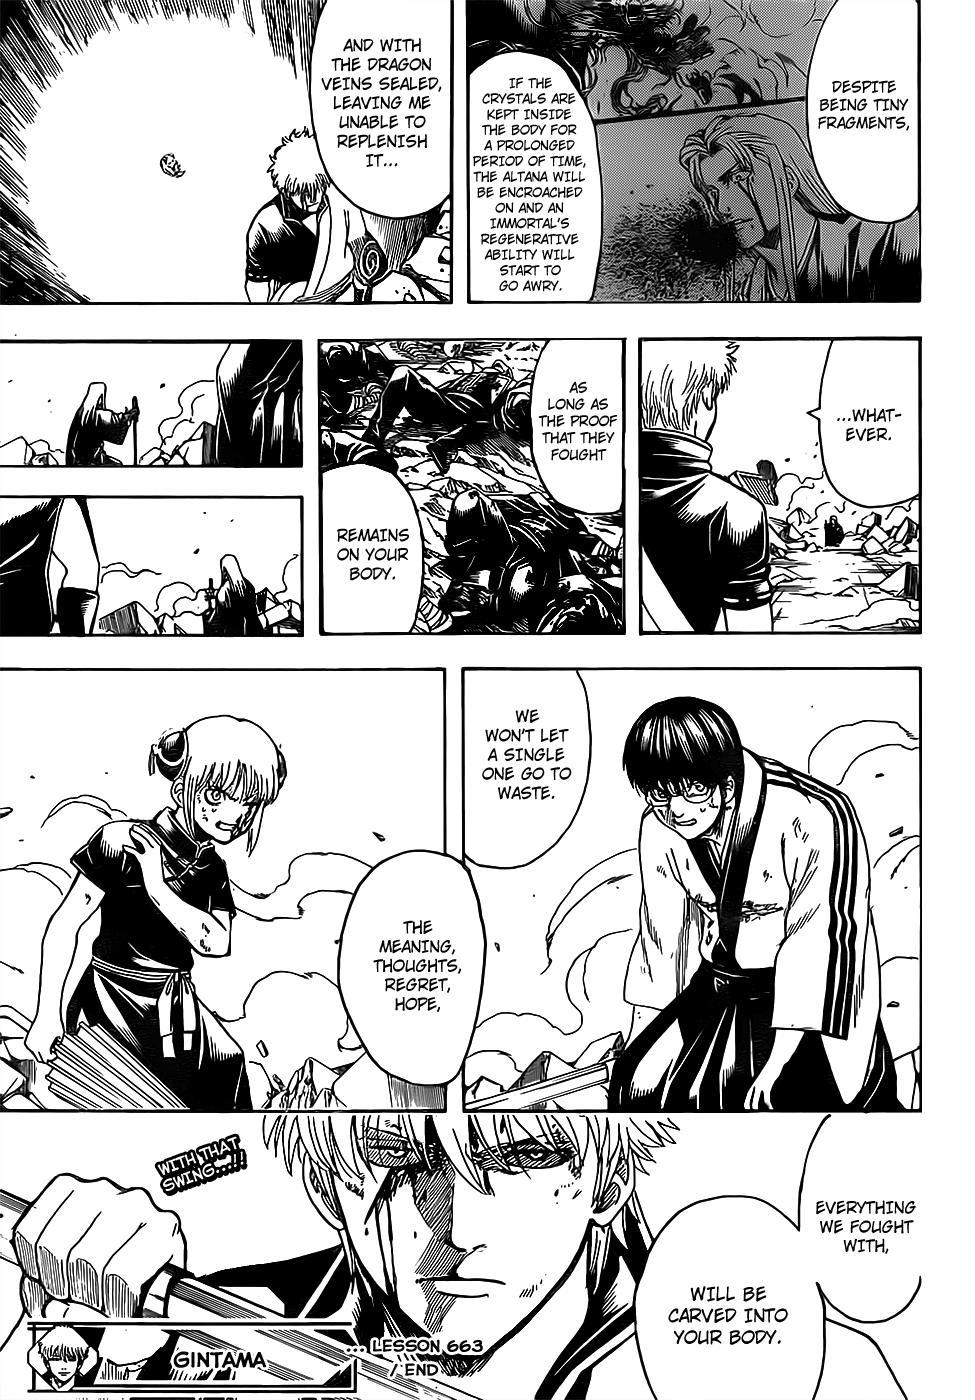 Gintama - Chapter 666